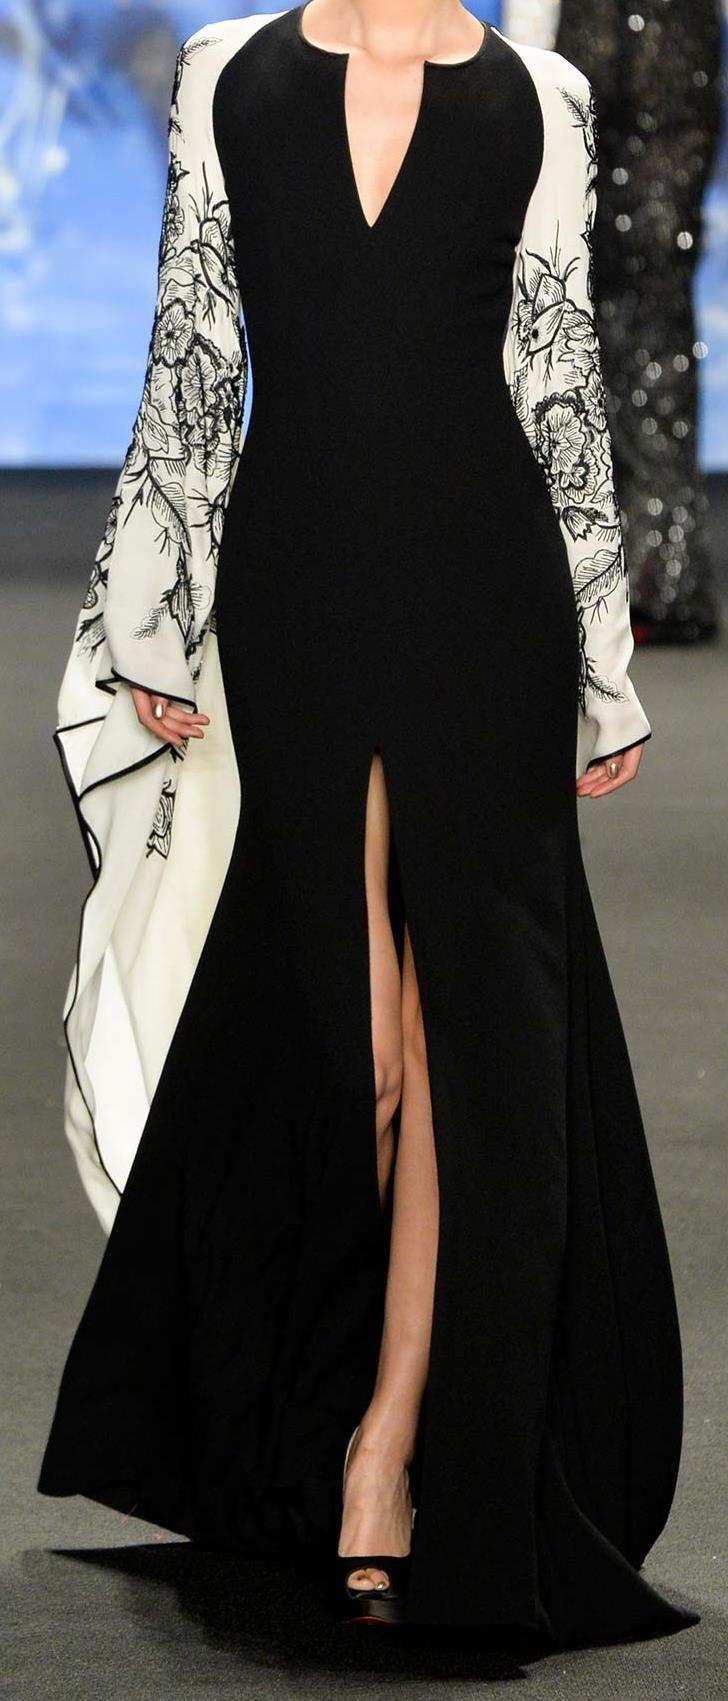 Naeem Khan Fall 2015 RTW stunning black and ivory dress with kimono style sleeve.